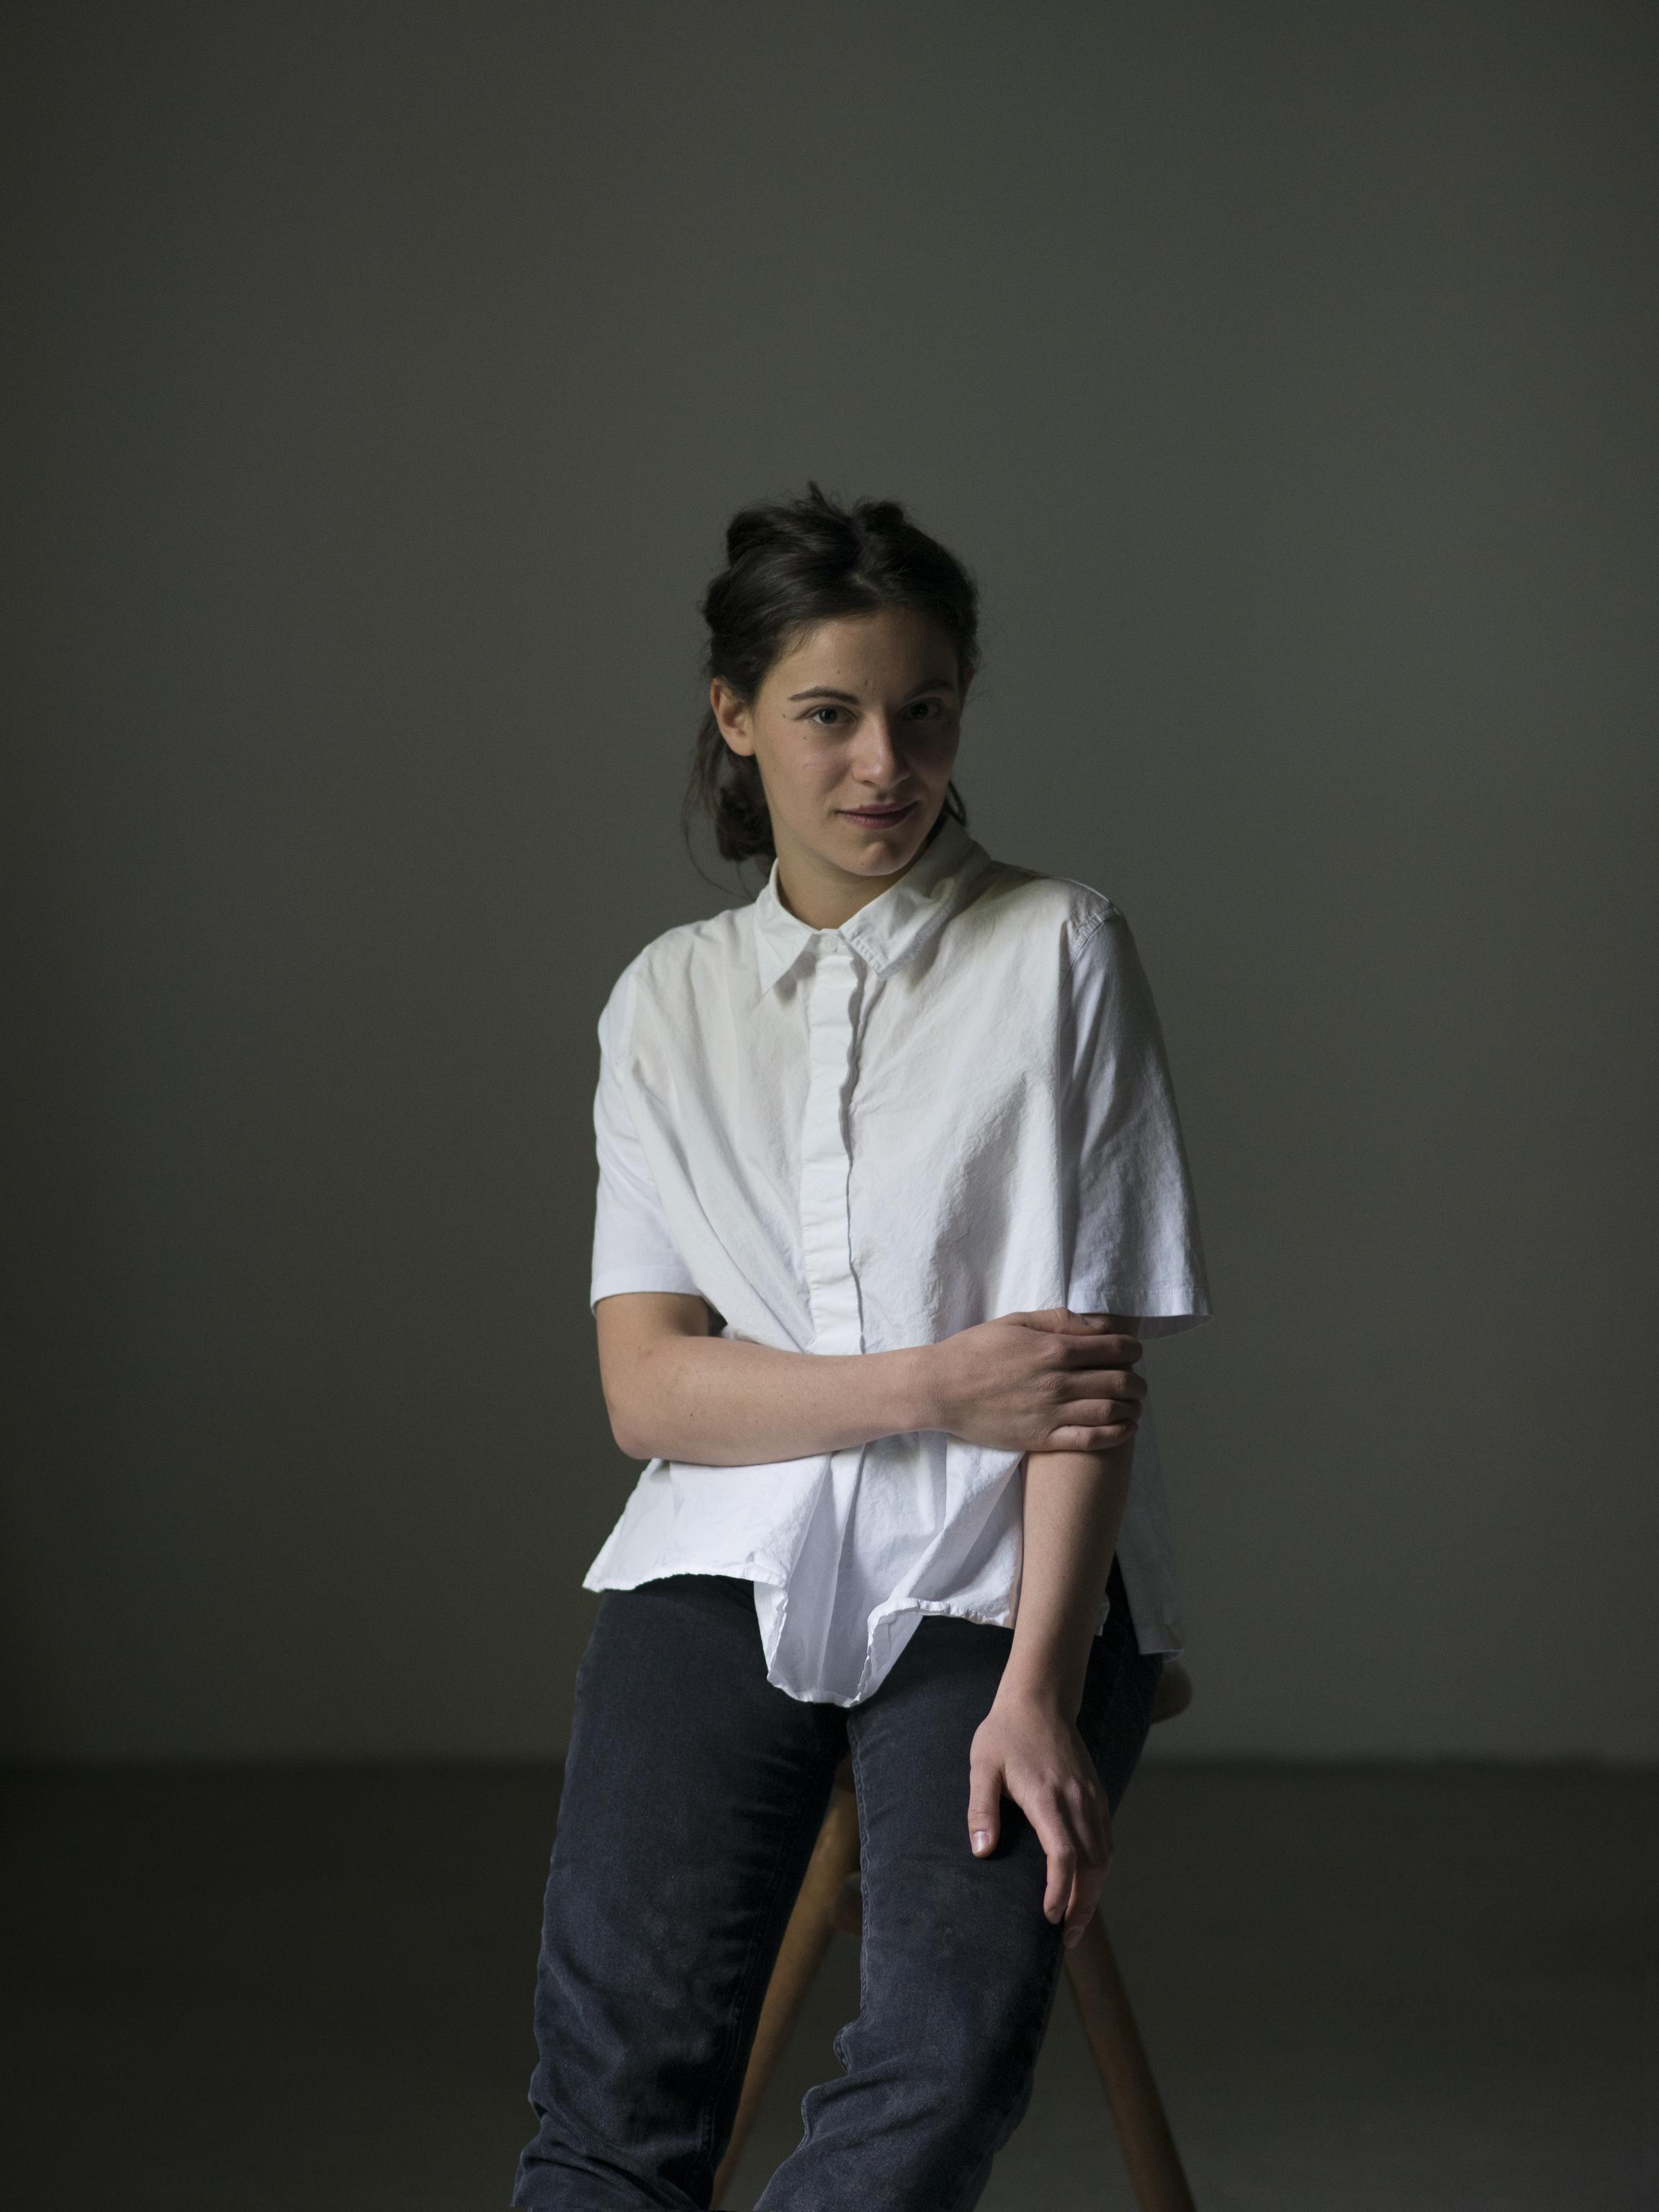 Gina Proenza, 2019